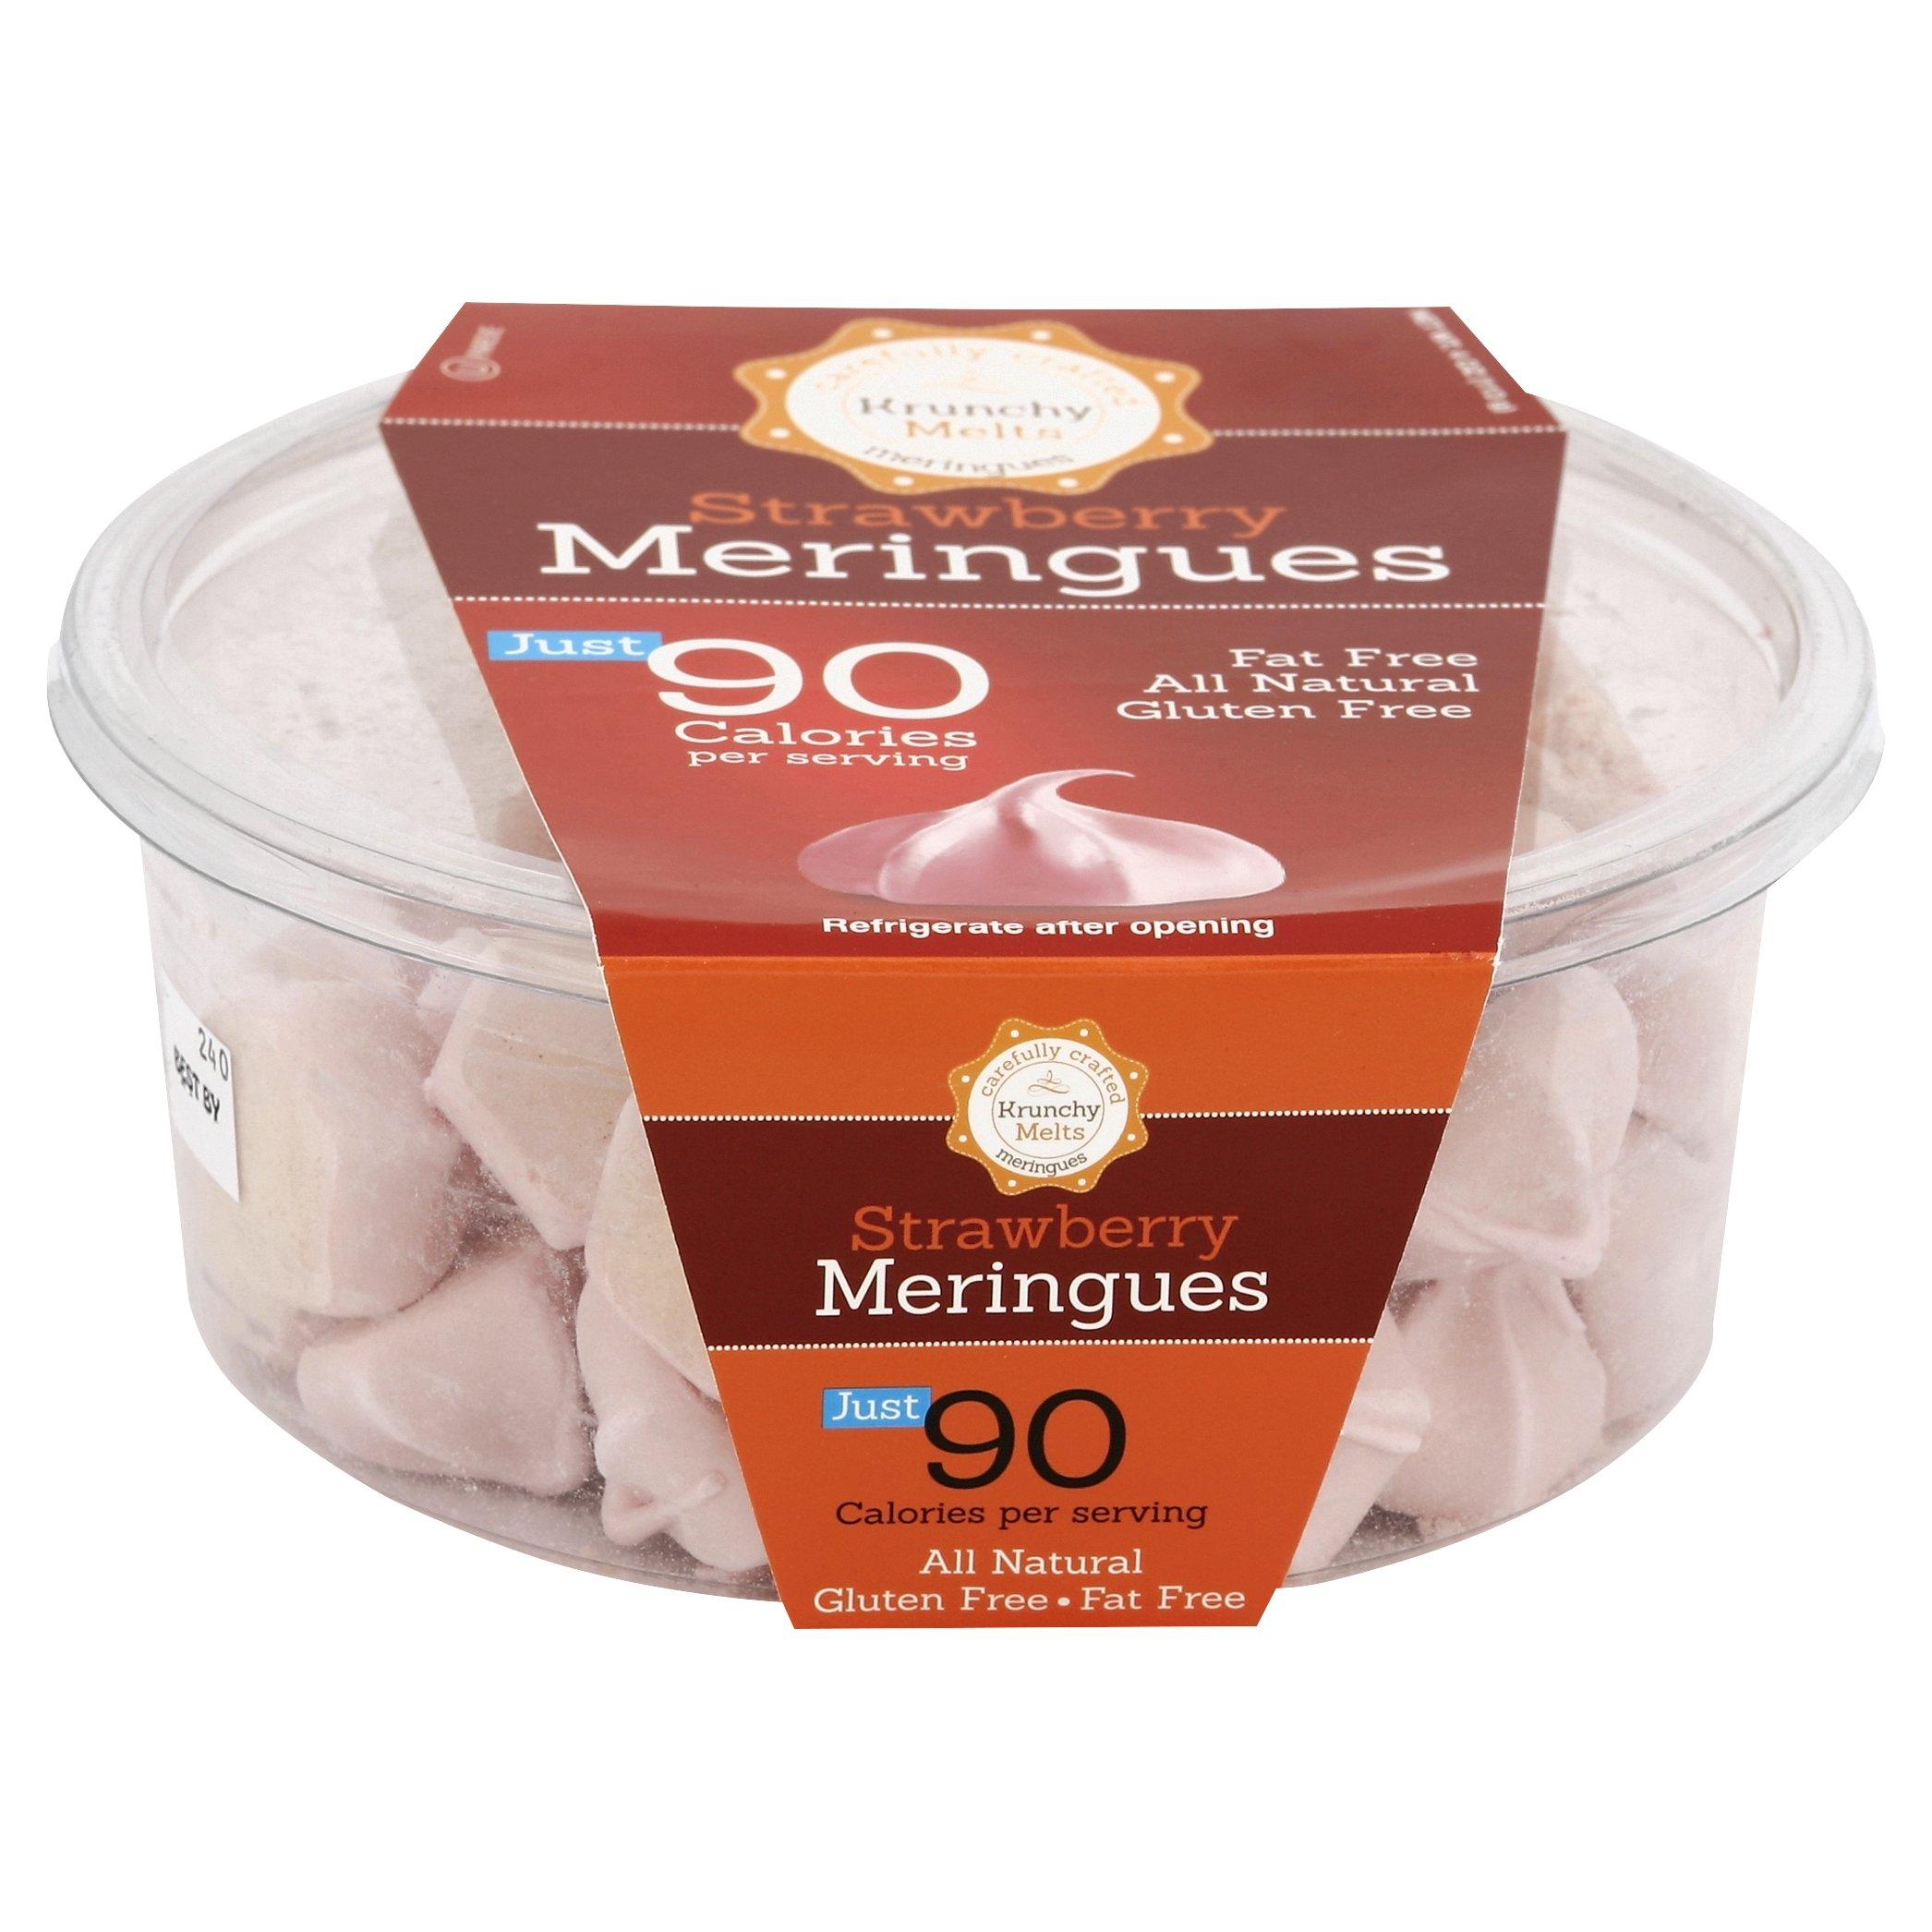 Krunchy Melts Meringue Tub Strawberry